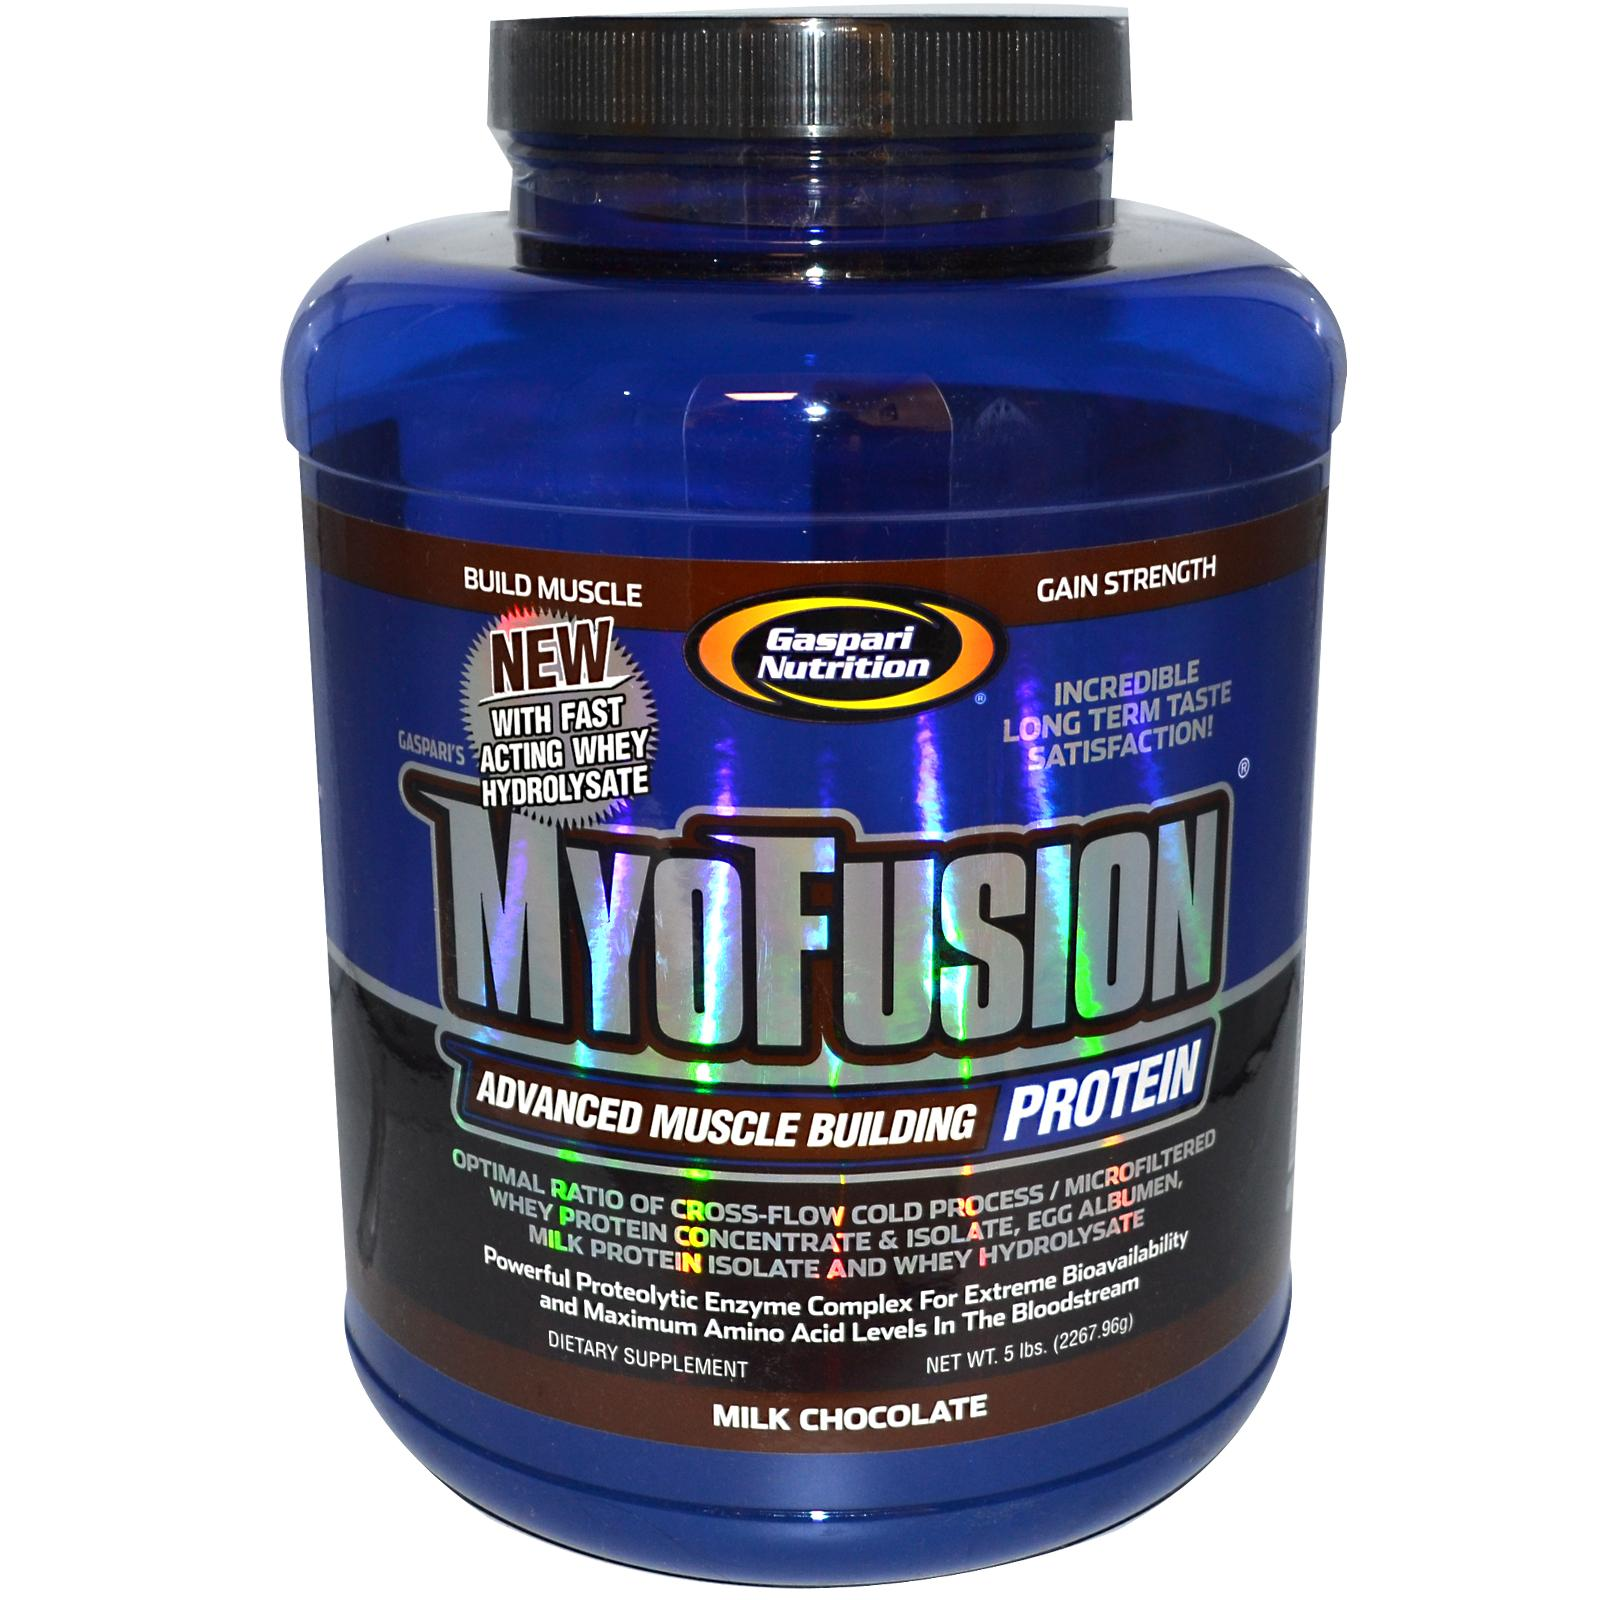 AvP Supplement (Bodybuilding Supplement Store): Myofusion 5lbs